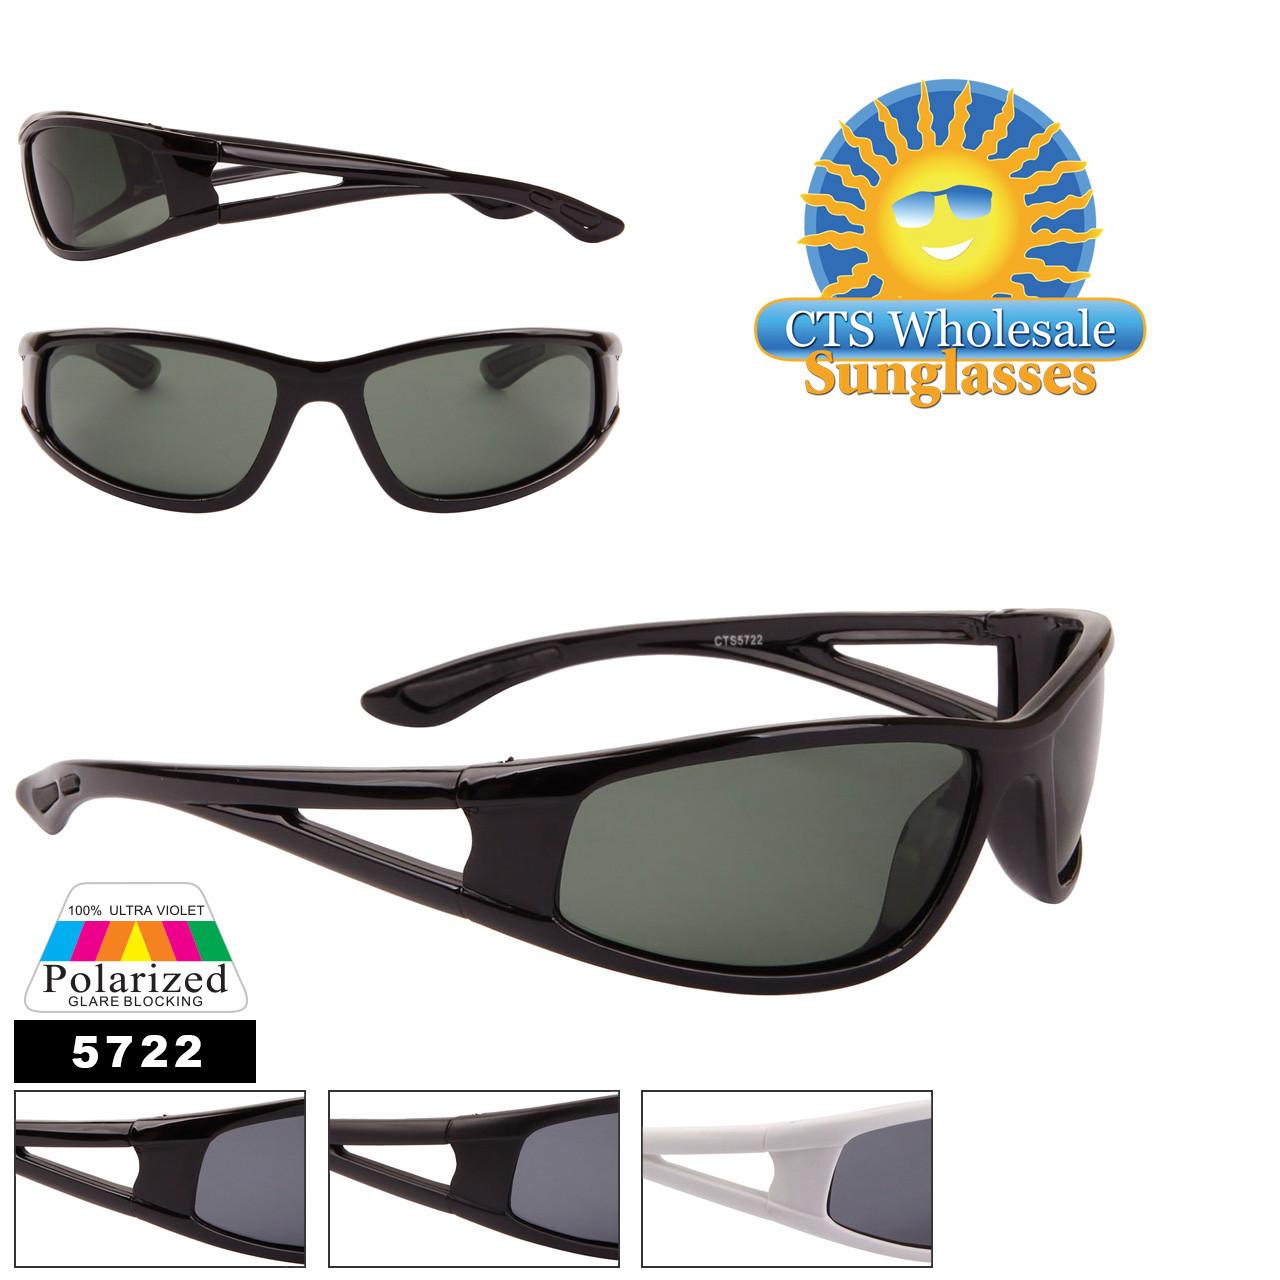 Polarized Sports Sunglasses by the Dozen - Style #5722